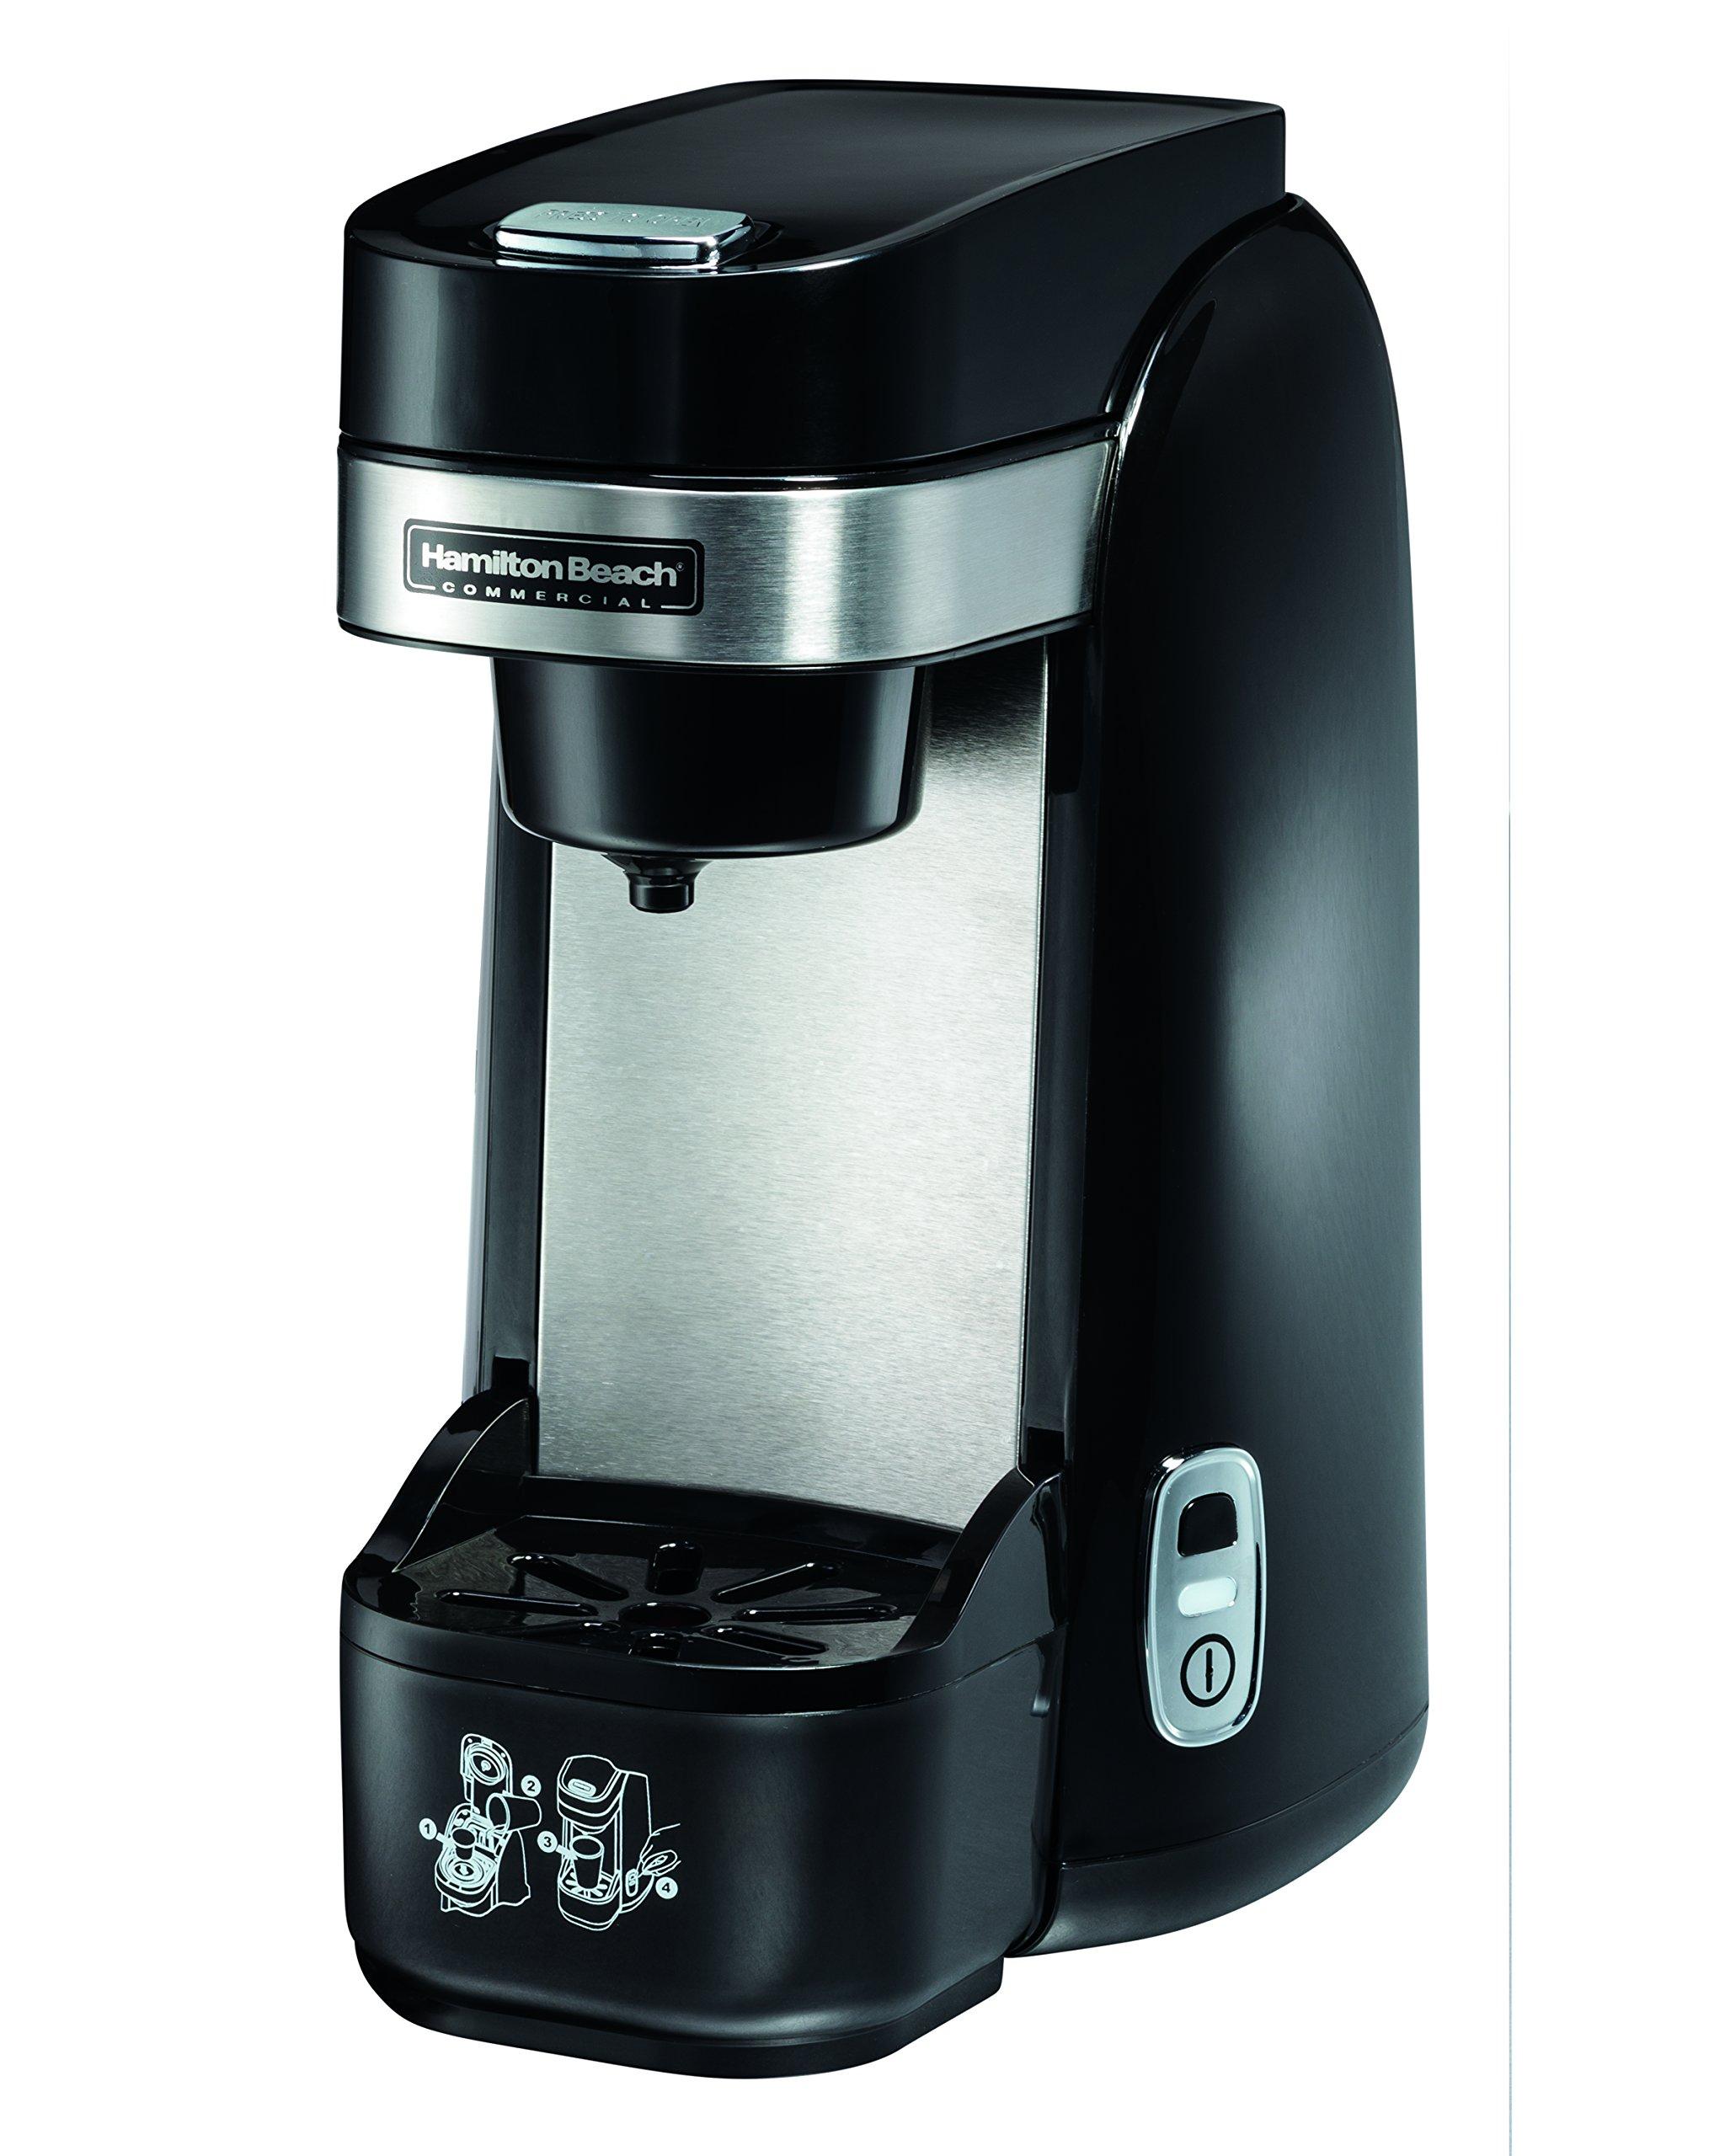 Hamilton Beach Commercial HDC310 Deluxe Single-Serve Coffeemaker, Deluxe Single-Serve Pod Coffeemaker, Auto Shutoff, Drip Tray, Black/Stainless Steel by Hamilton Beach